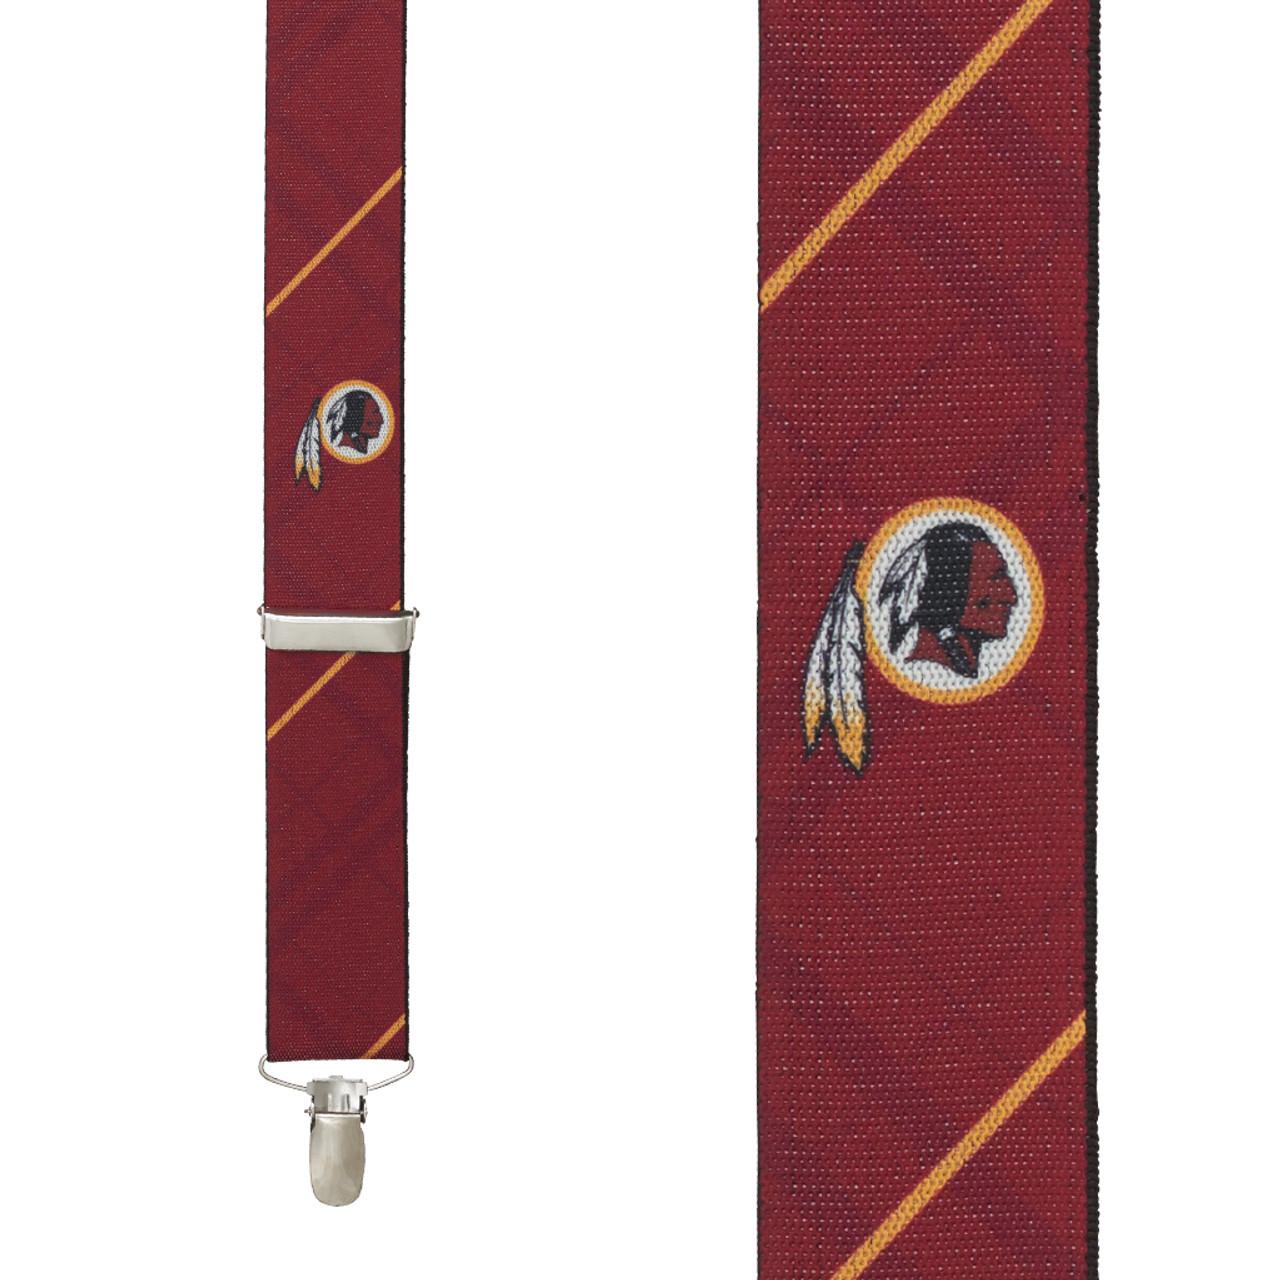 f257458f4 Washington Redskins Suspenders - Front View